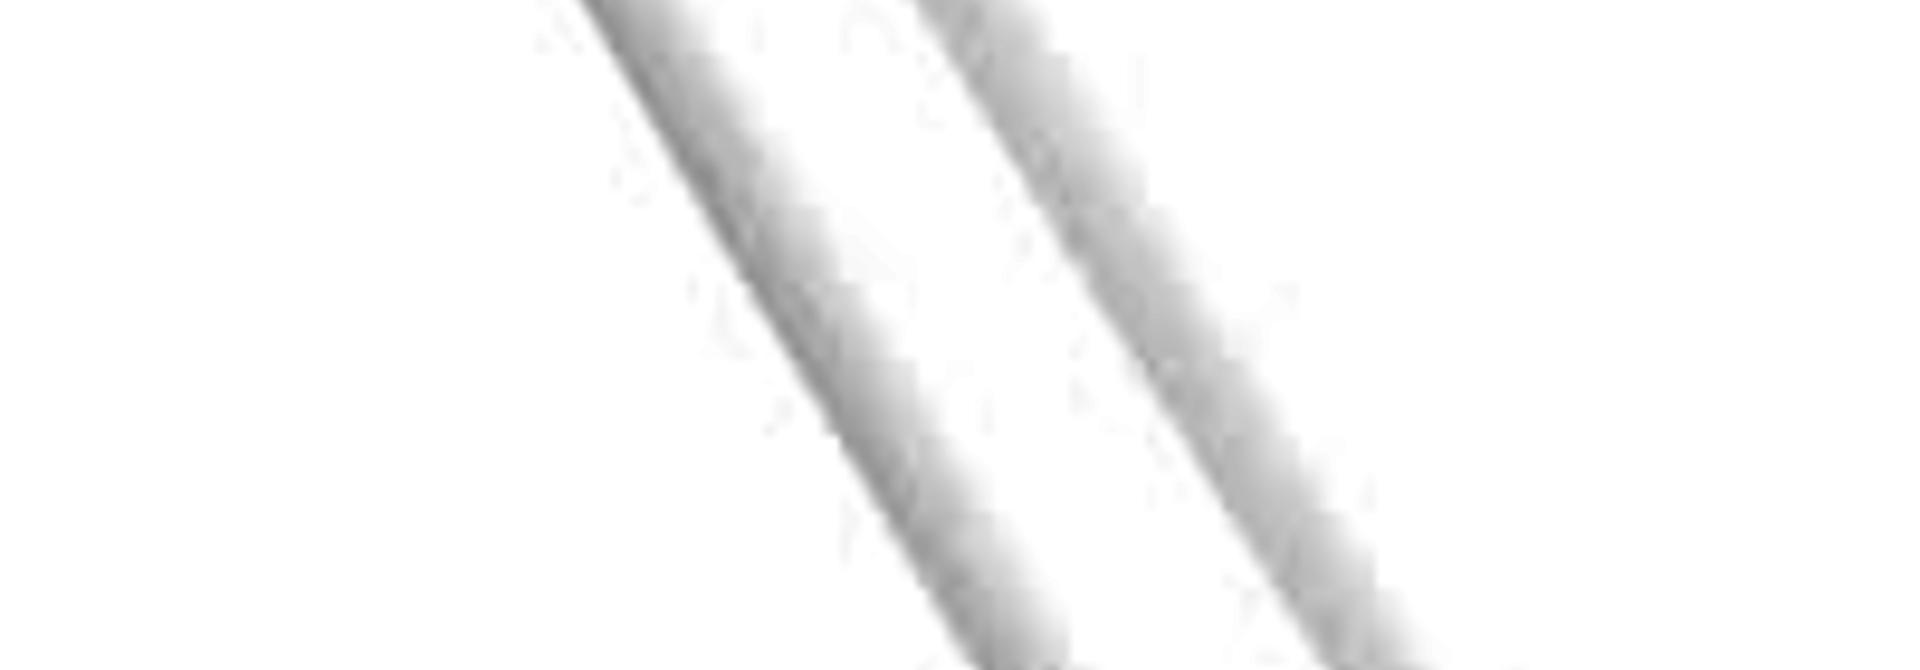 CUTIPOL - Goa Chopsticks 3 pcs White / Stainless steel